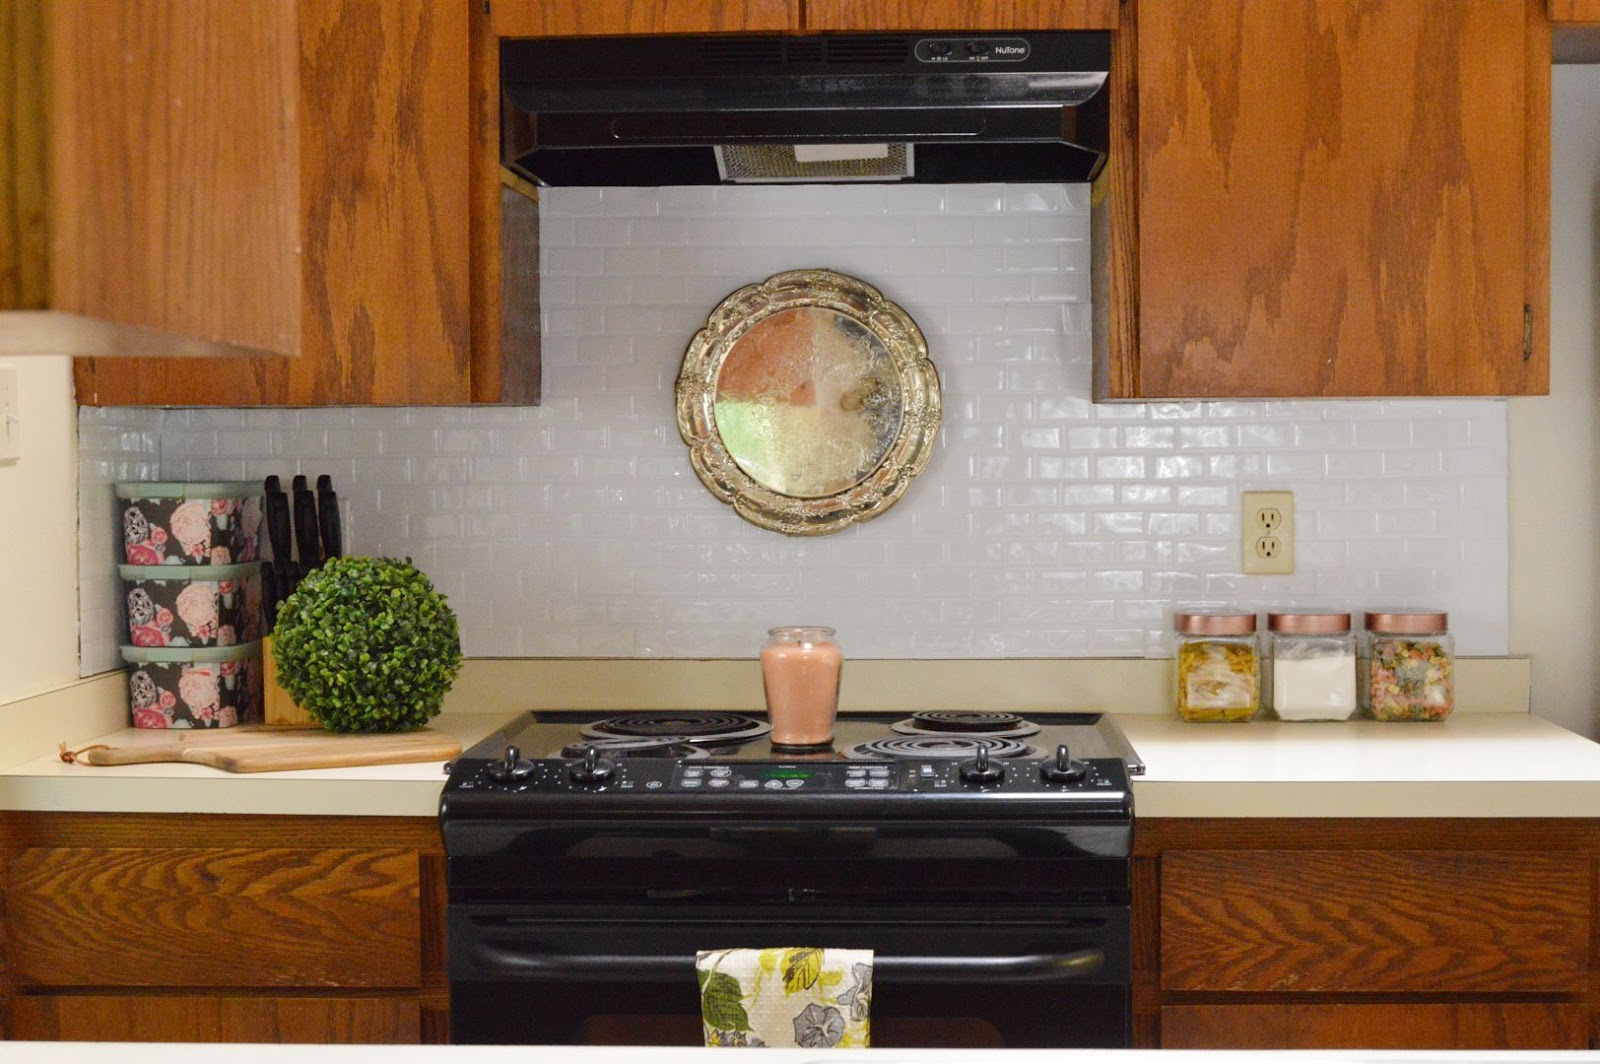 Rental friendly kitchen makeover, smart tiles, white subway tiles, mini kitchen makeover, rental house, 1980's rental home, kitchen decor, interior design, Domicile 37